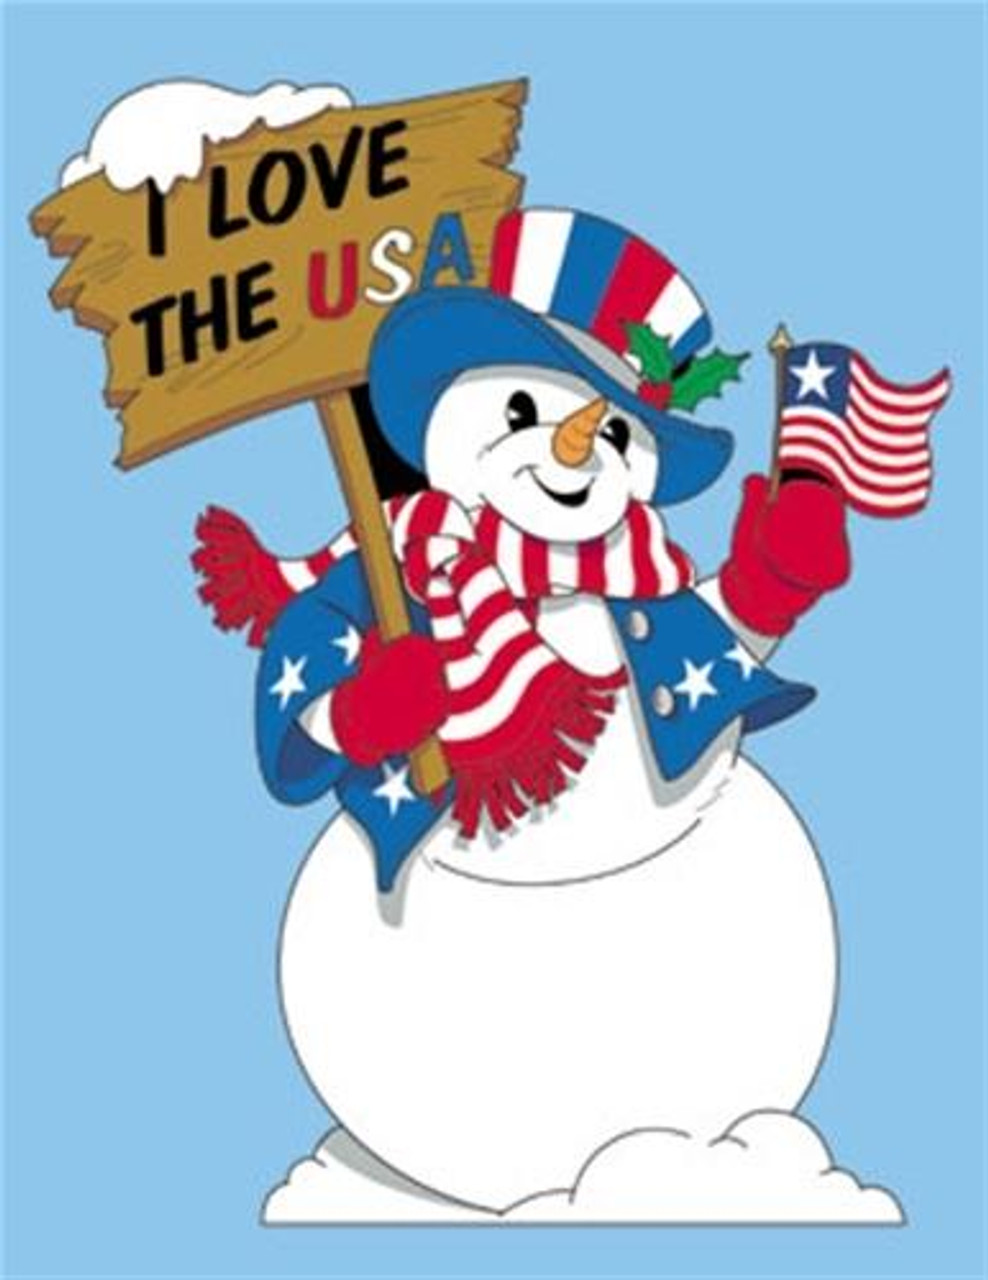 Sherwood Uncle Sam Snowman Woodworking Plan is Americas favorite version of Patriotism.